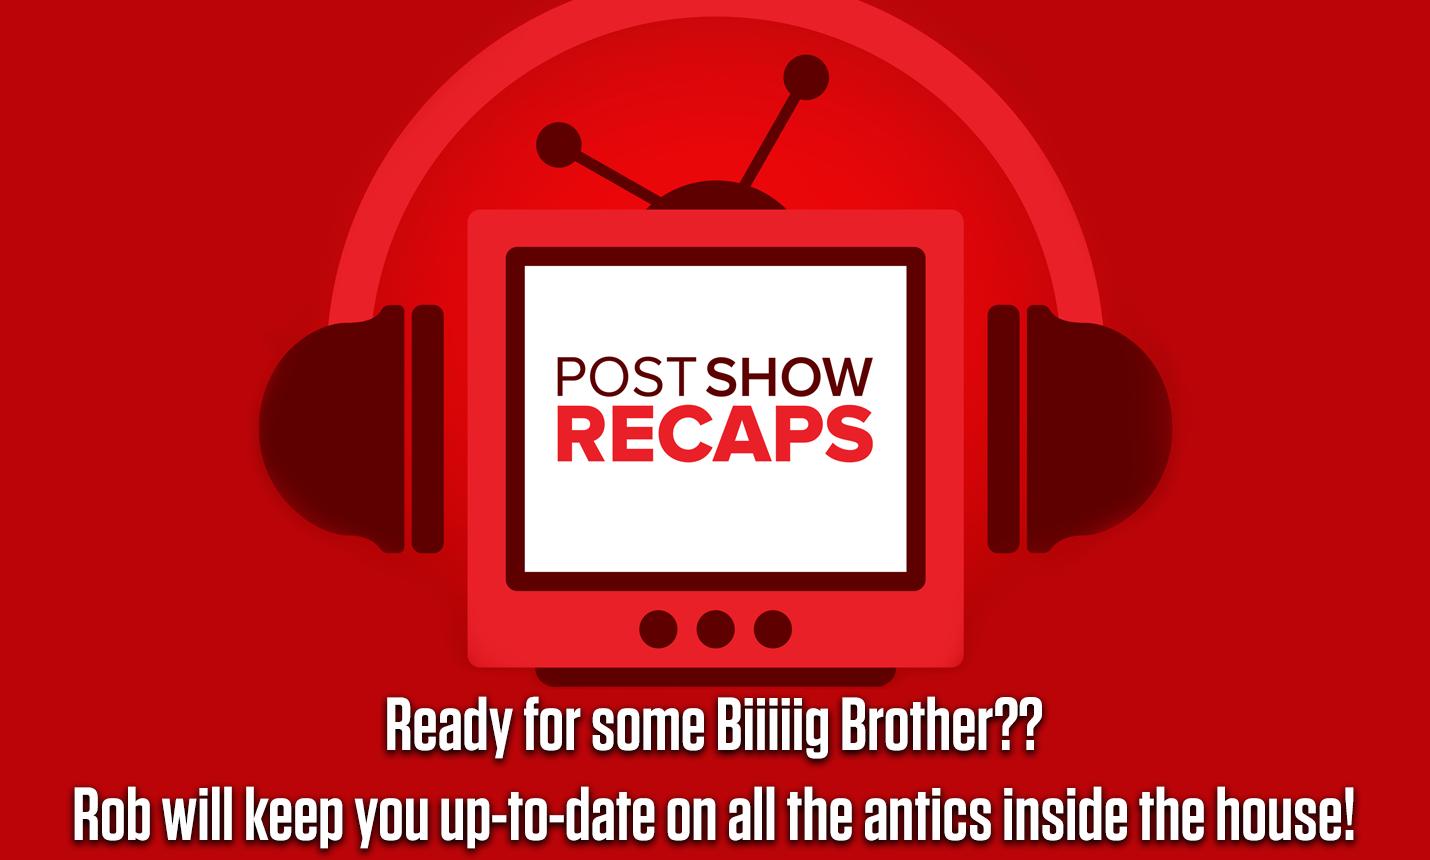 PodcastOne: Post Show Recaps: LIVE TV & Movie Podcasts with Rob